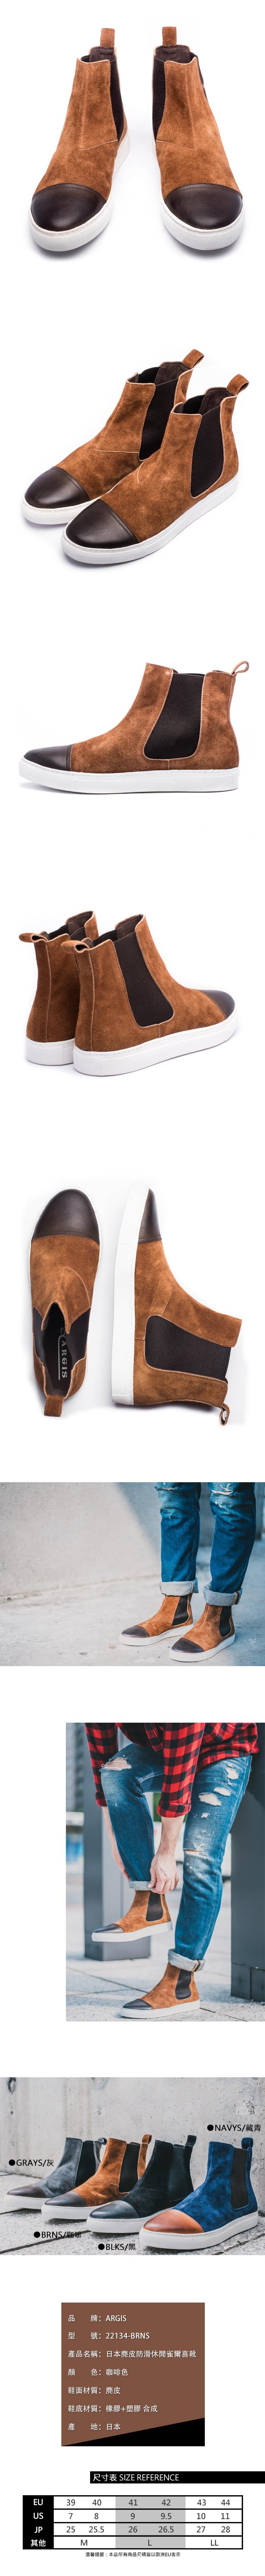 ARGIS Japanese suede slippery casual erxi boots  22134咖啡-Japan ... 3e4419bc676